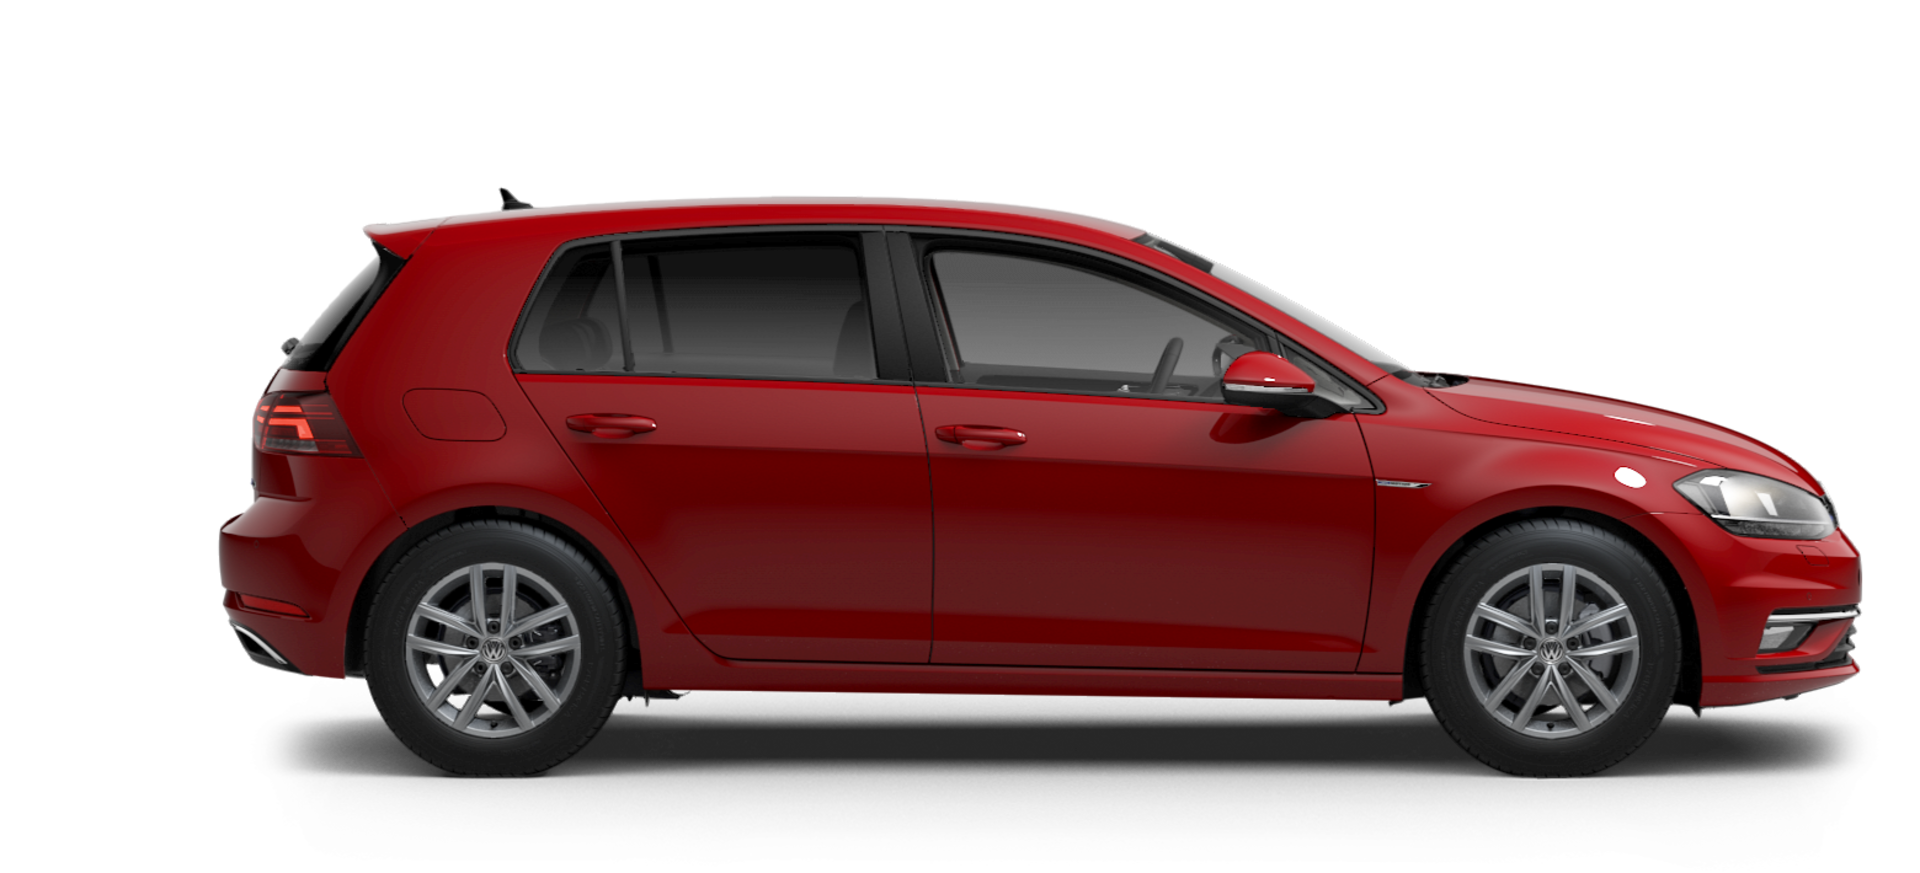 Golf Comfortline 1.5 TSI ACT / 130 CP/96 kW / 1.5l / Manuala, 6 trepte / 4-usi : Volkswagen Golf